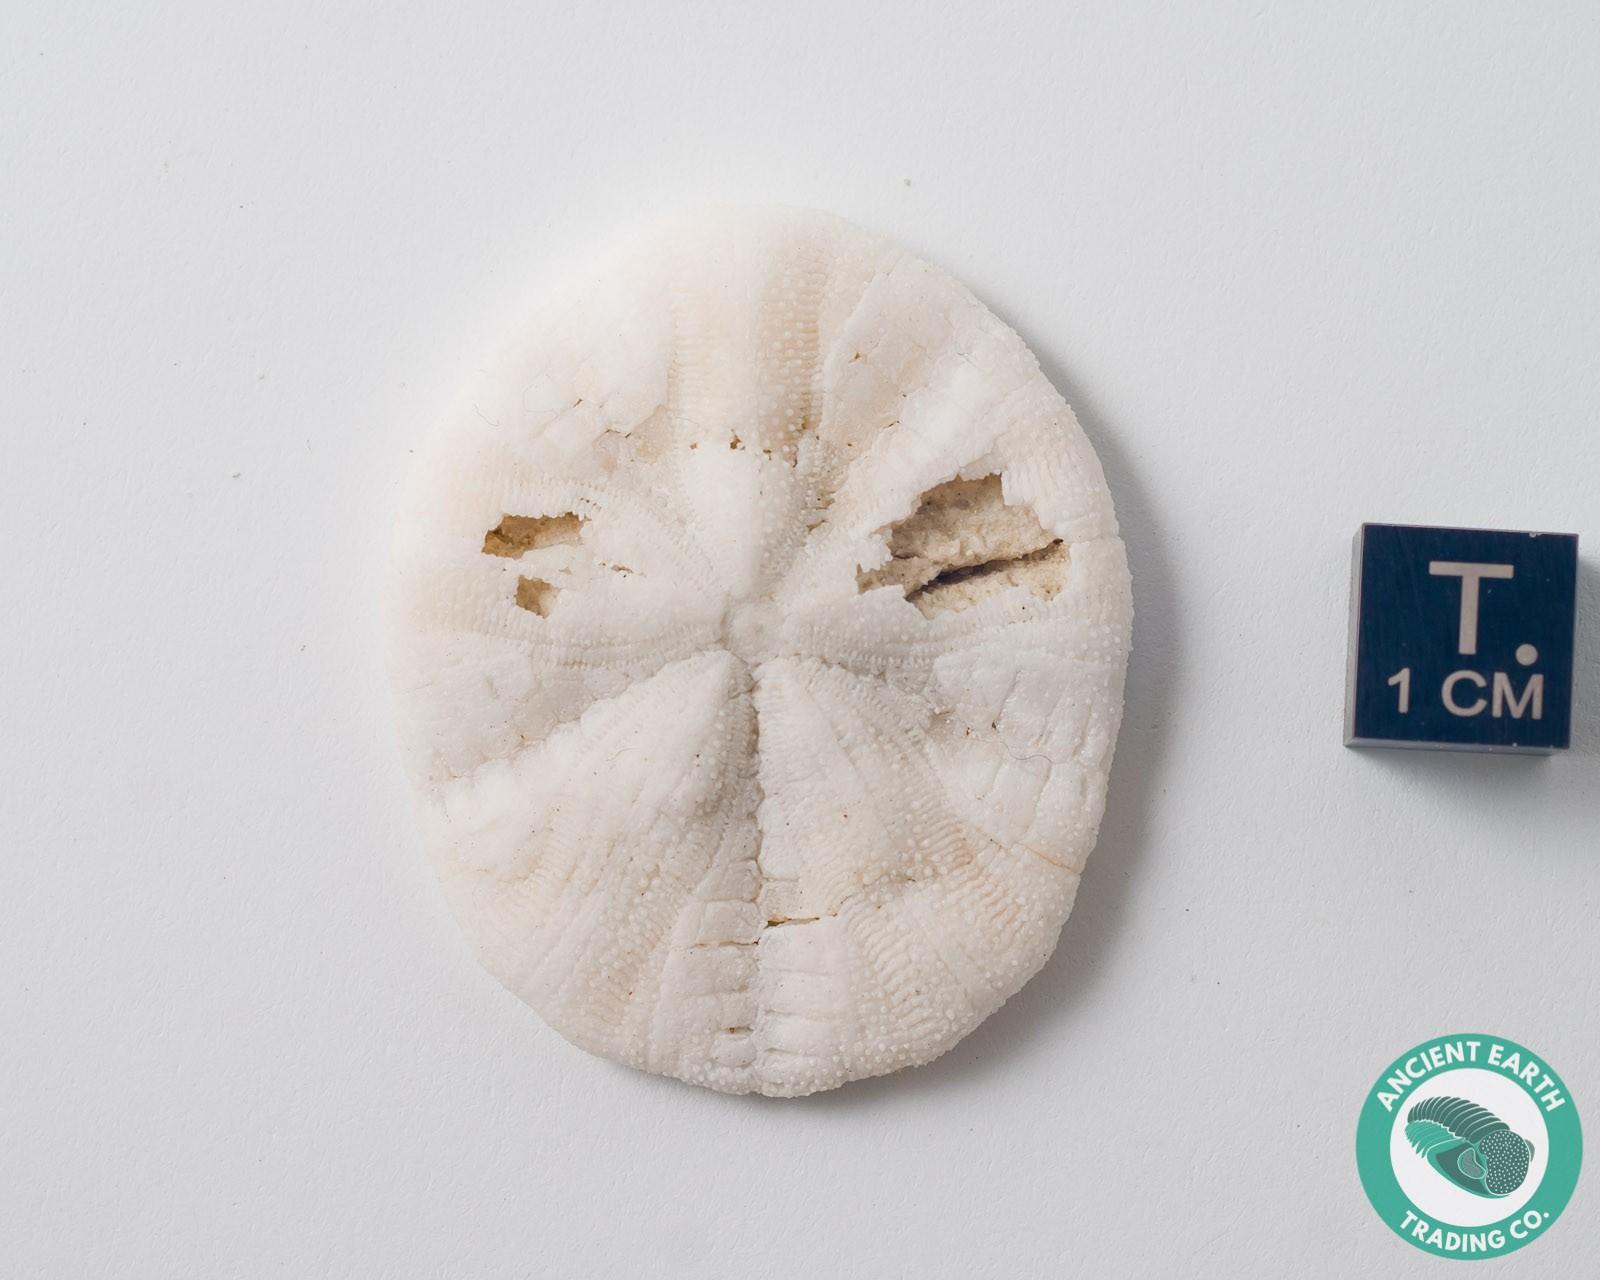 Sand Dollar Fossil Astrodapsis - California